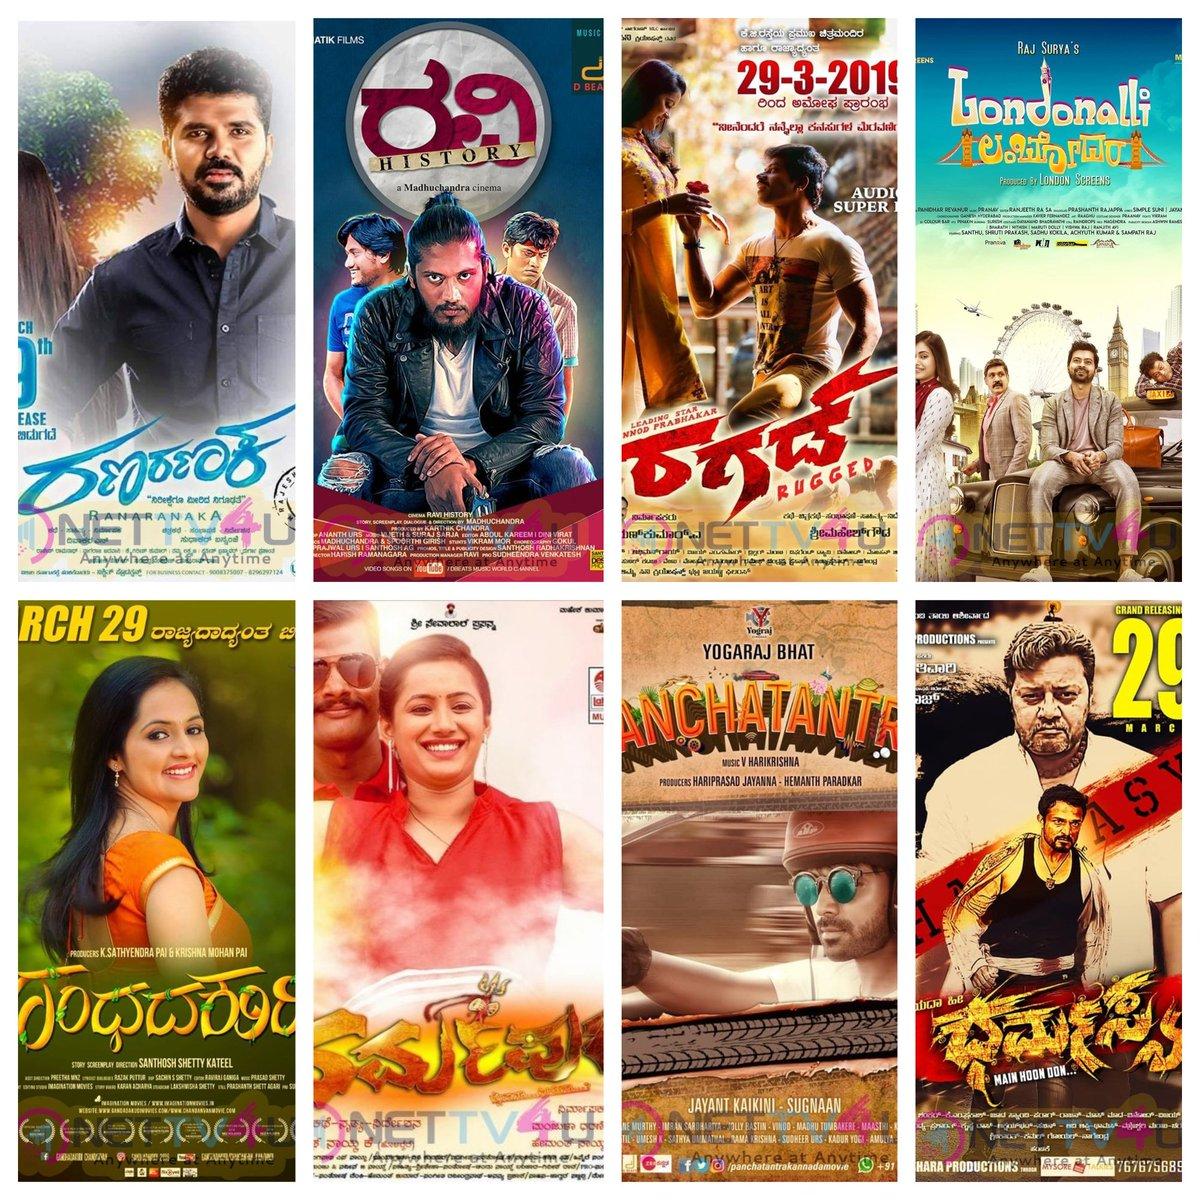 This Week 's Kannada Movie Releases !!! Our Website Link